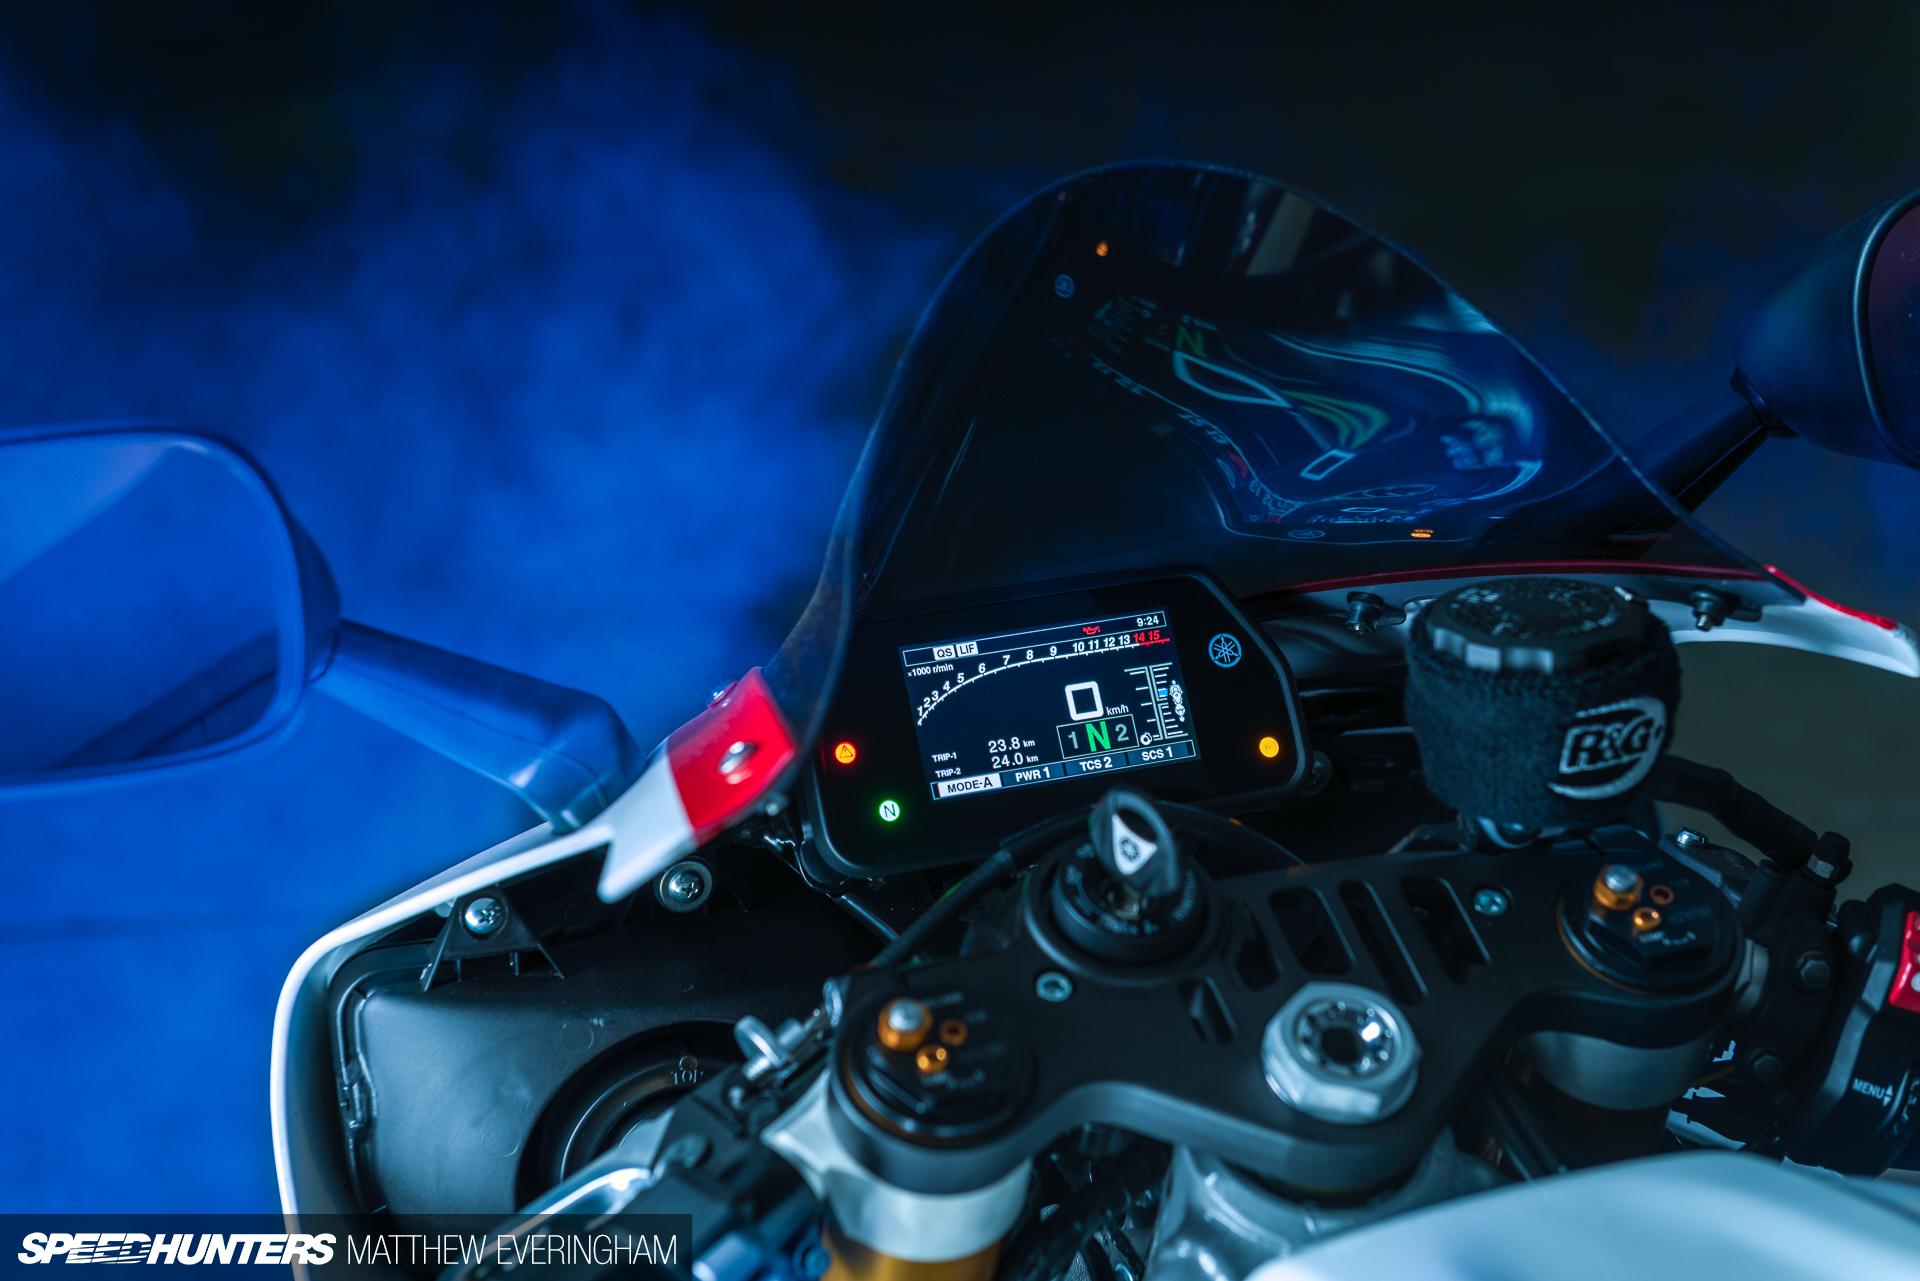 Yamaha 1000 R1 ... - Page 10 Yamaha-R1-20th-Anniversary-Boxer-Matthew-Everingham-Speedhunters-8